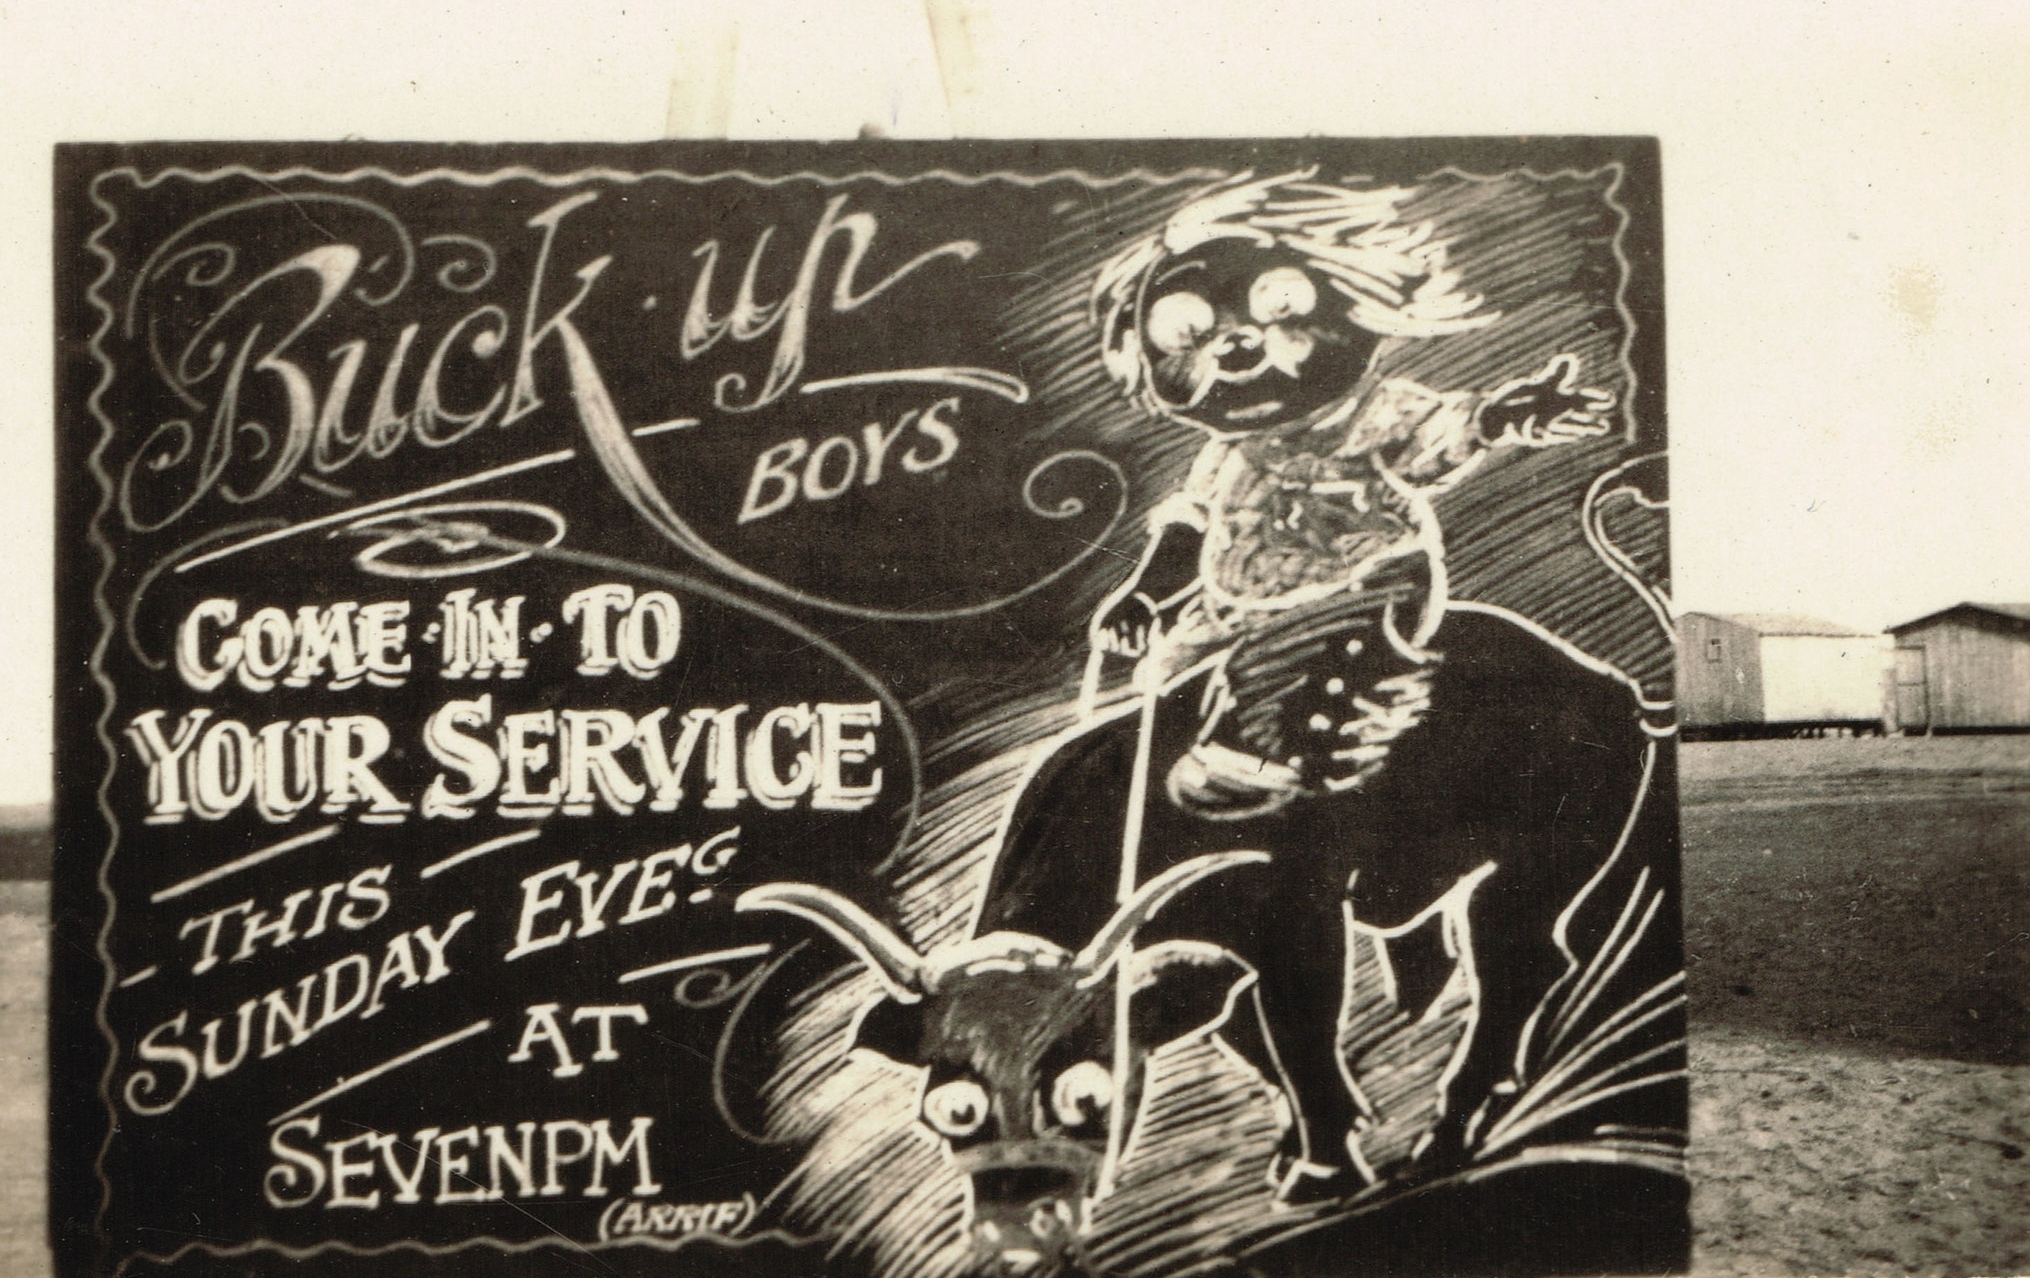 18 Buck up Boys Sunday Service.jpg